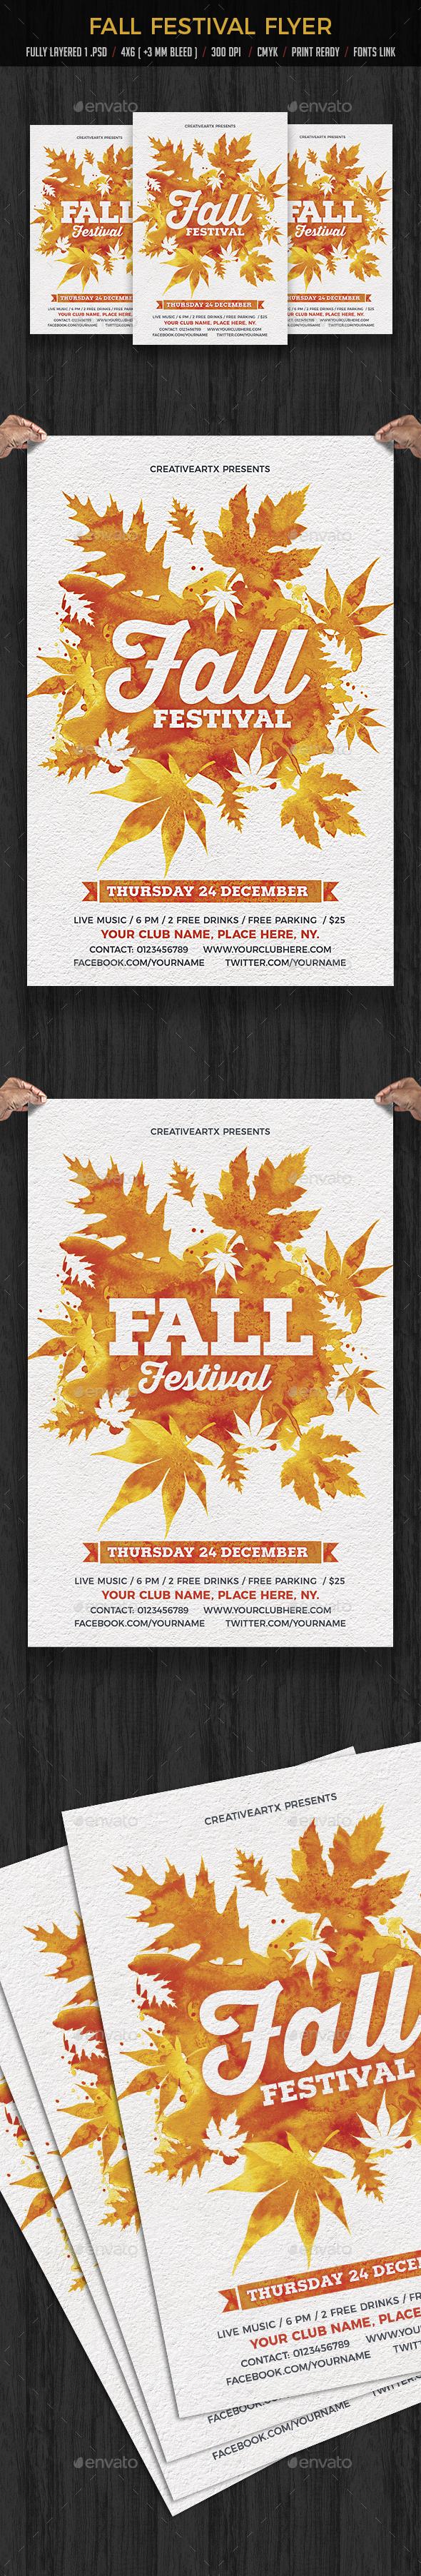 Fall / Autumn Festival Flyer - Events Flyers